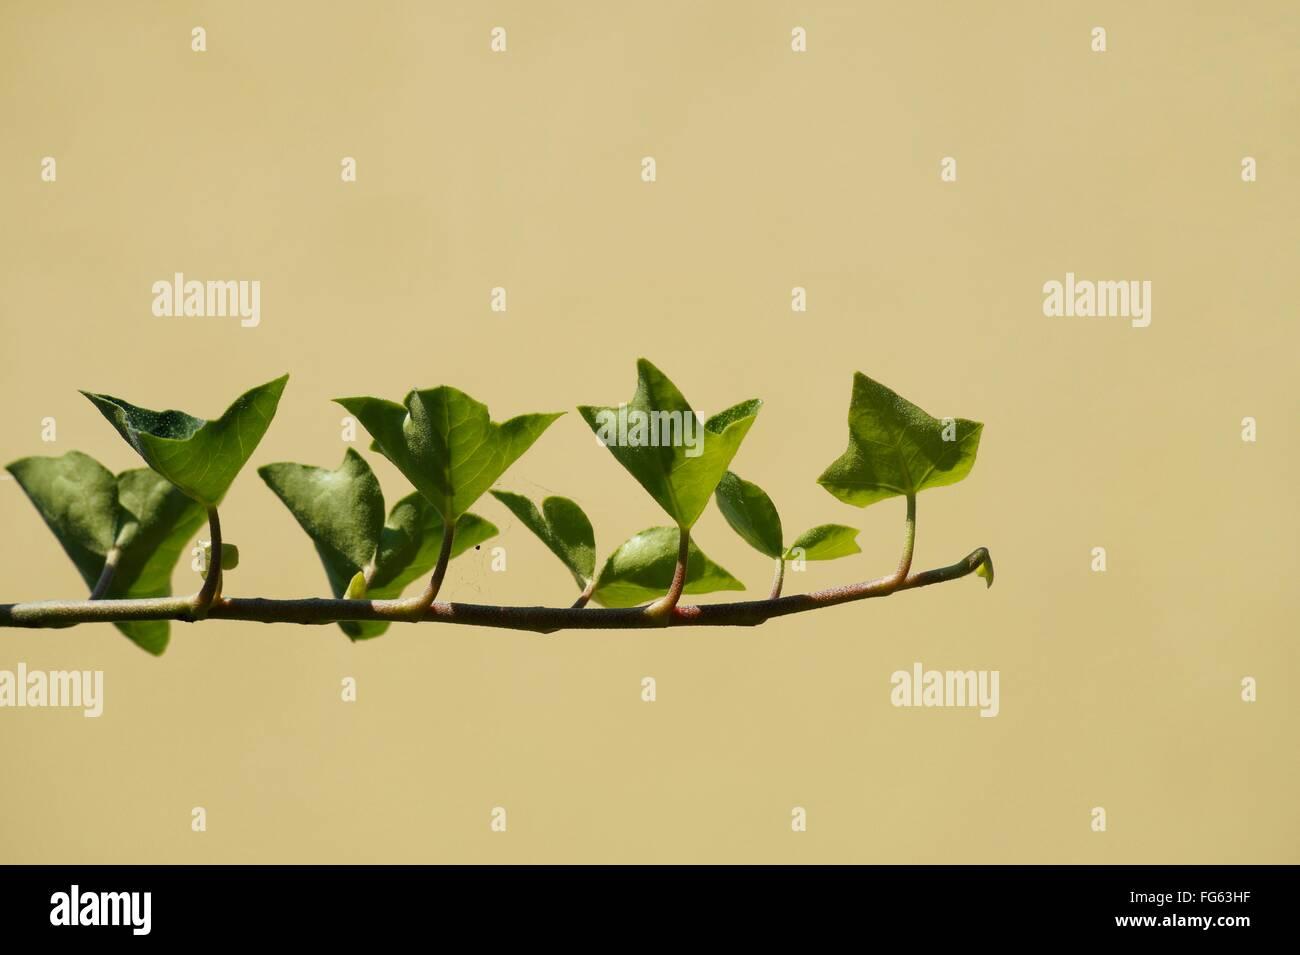 Leaves On Twig - Stock Image